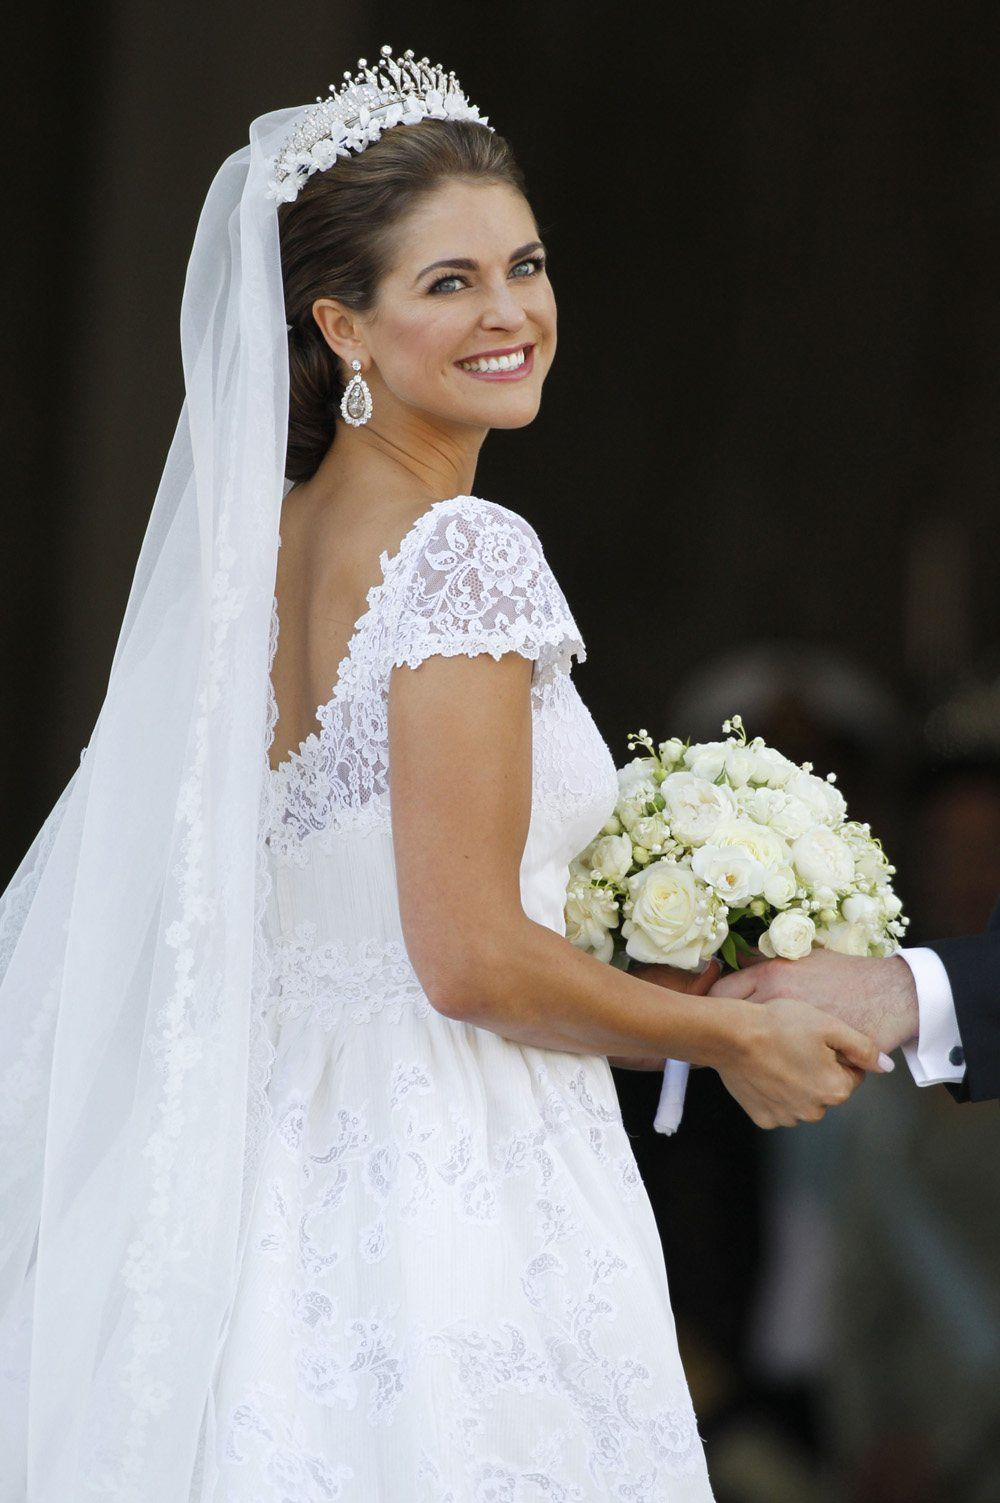 Princess Madeleine Of Sweden The Swedish Princess Wore A Cap